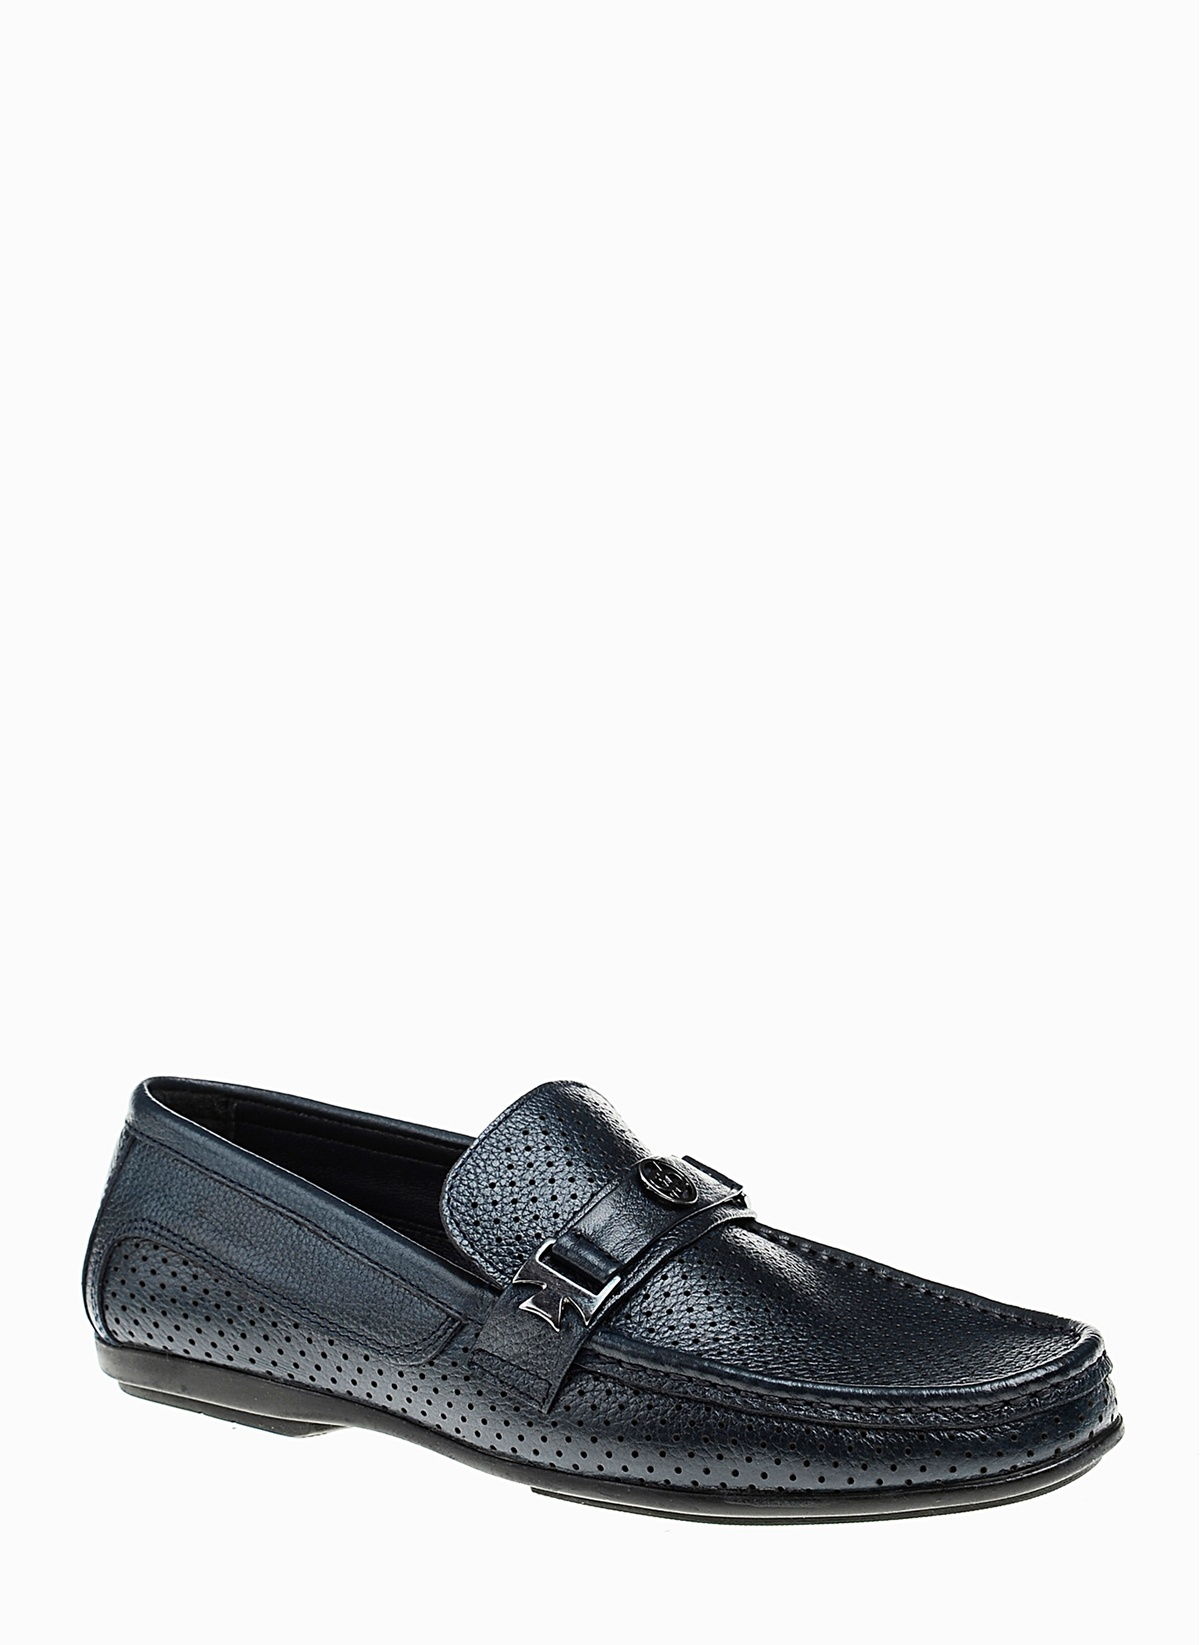 Divarese Ayakkabı 5021532-e-loafer – 189.0 TL